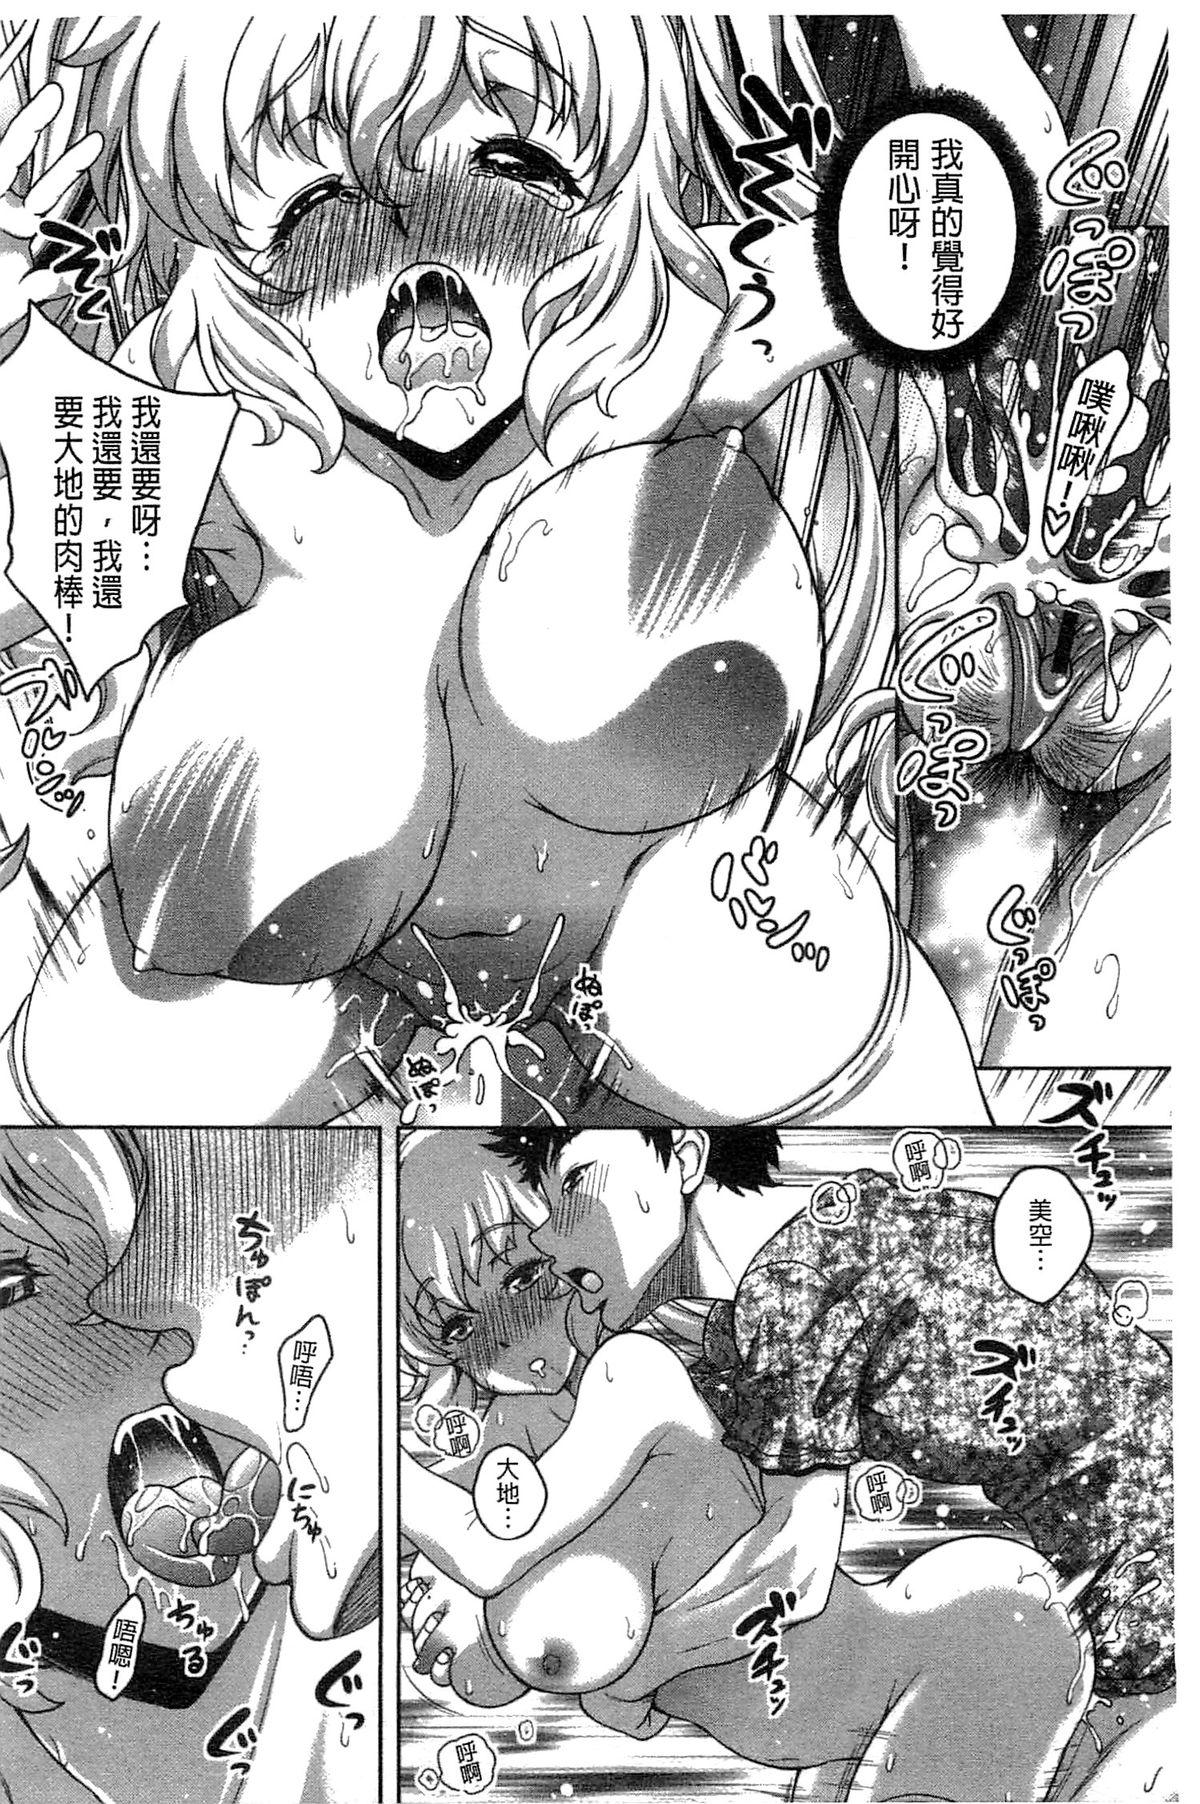 Hajimete nan dakara - First sexual experience 162